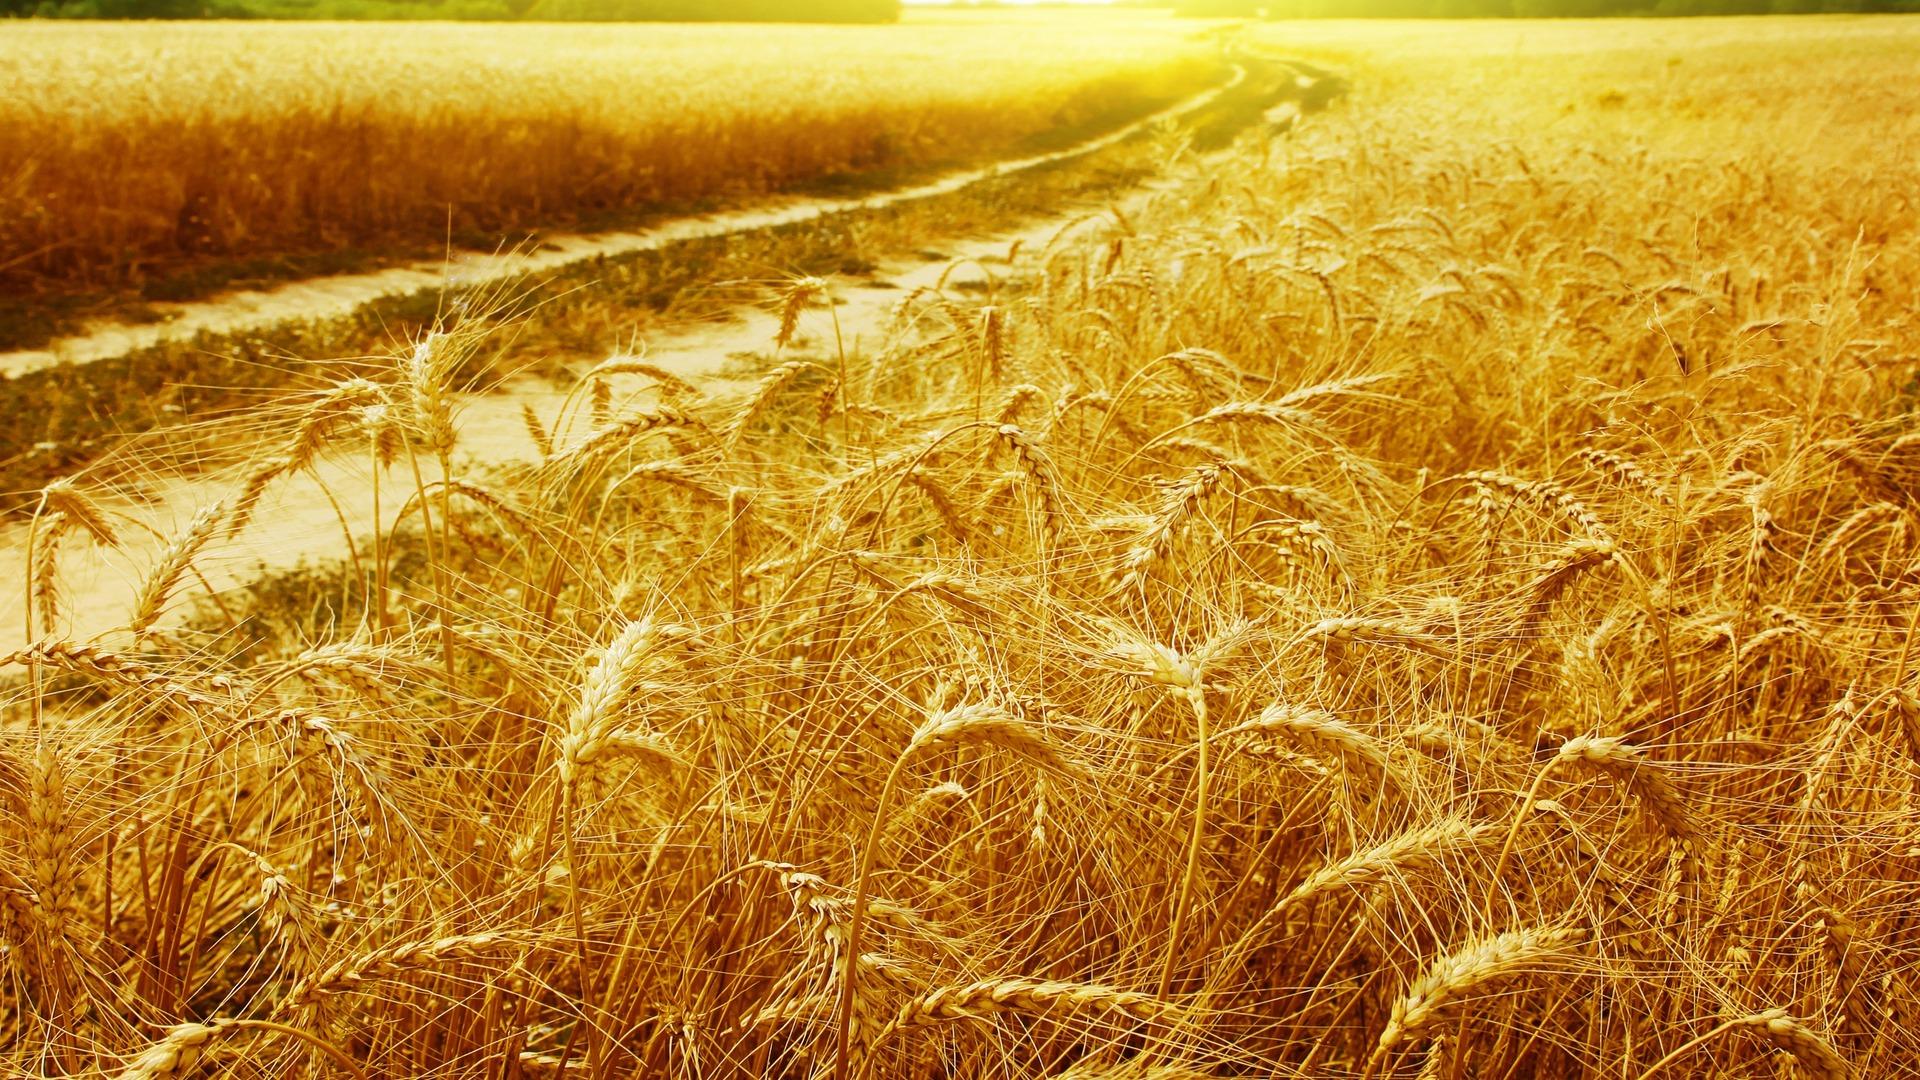 Янтарное поле без смс